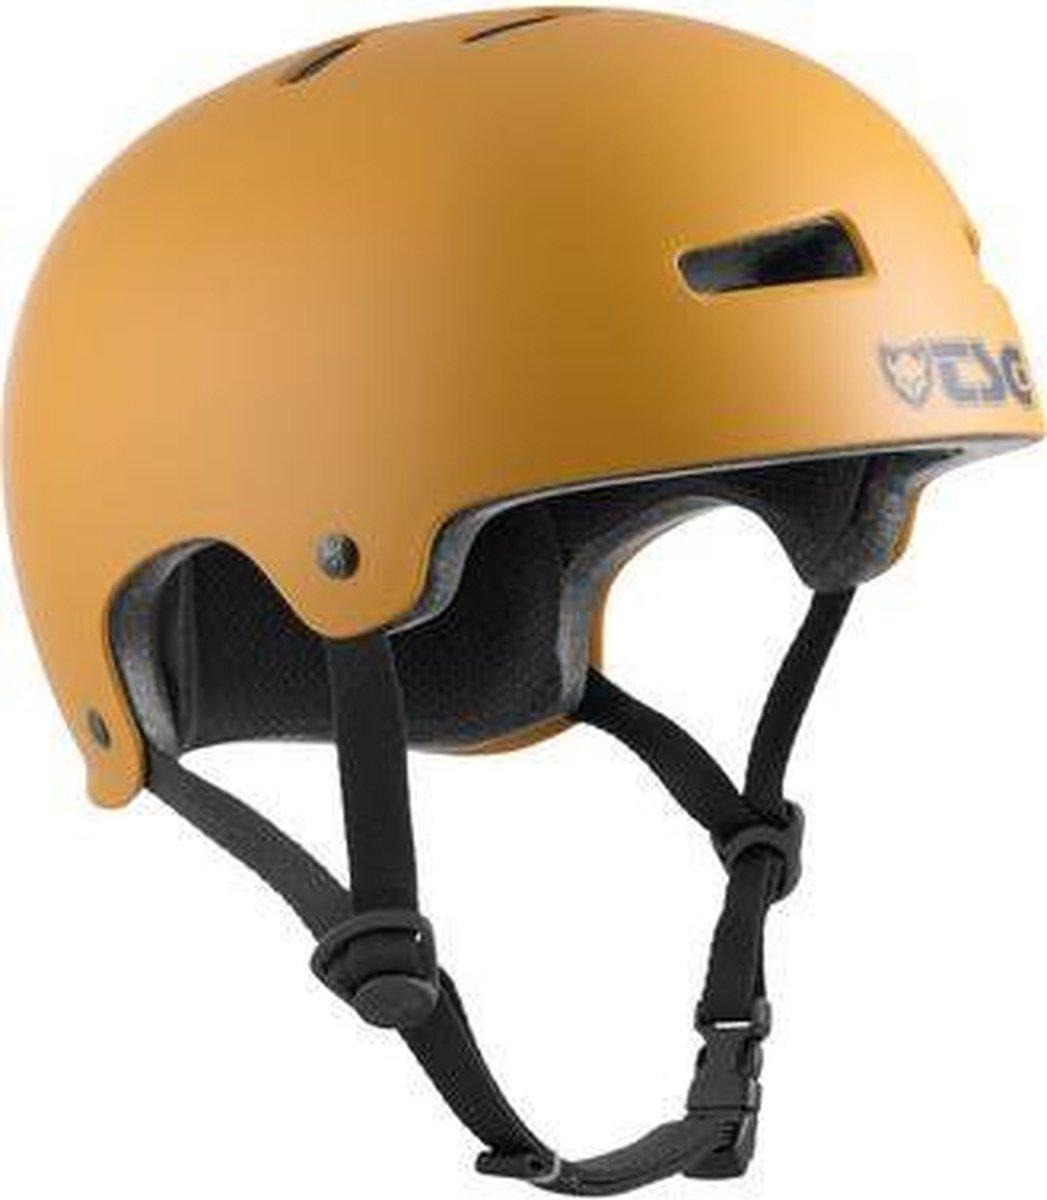 TSG Evolution skatehelm satin yellow ochre